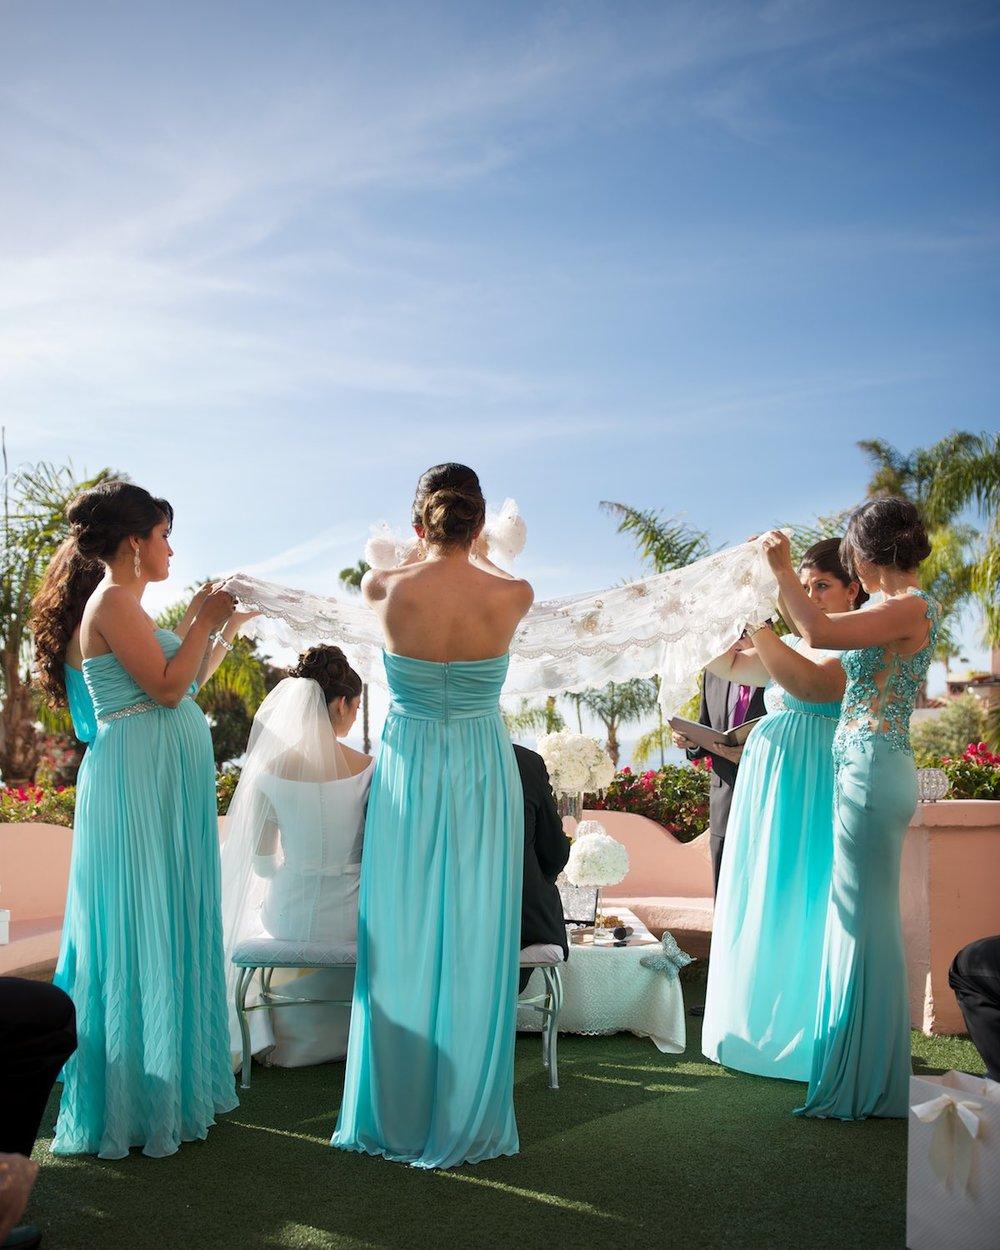 la-valencia-wedding-michal-pfeil-29.jpg